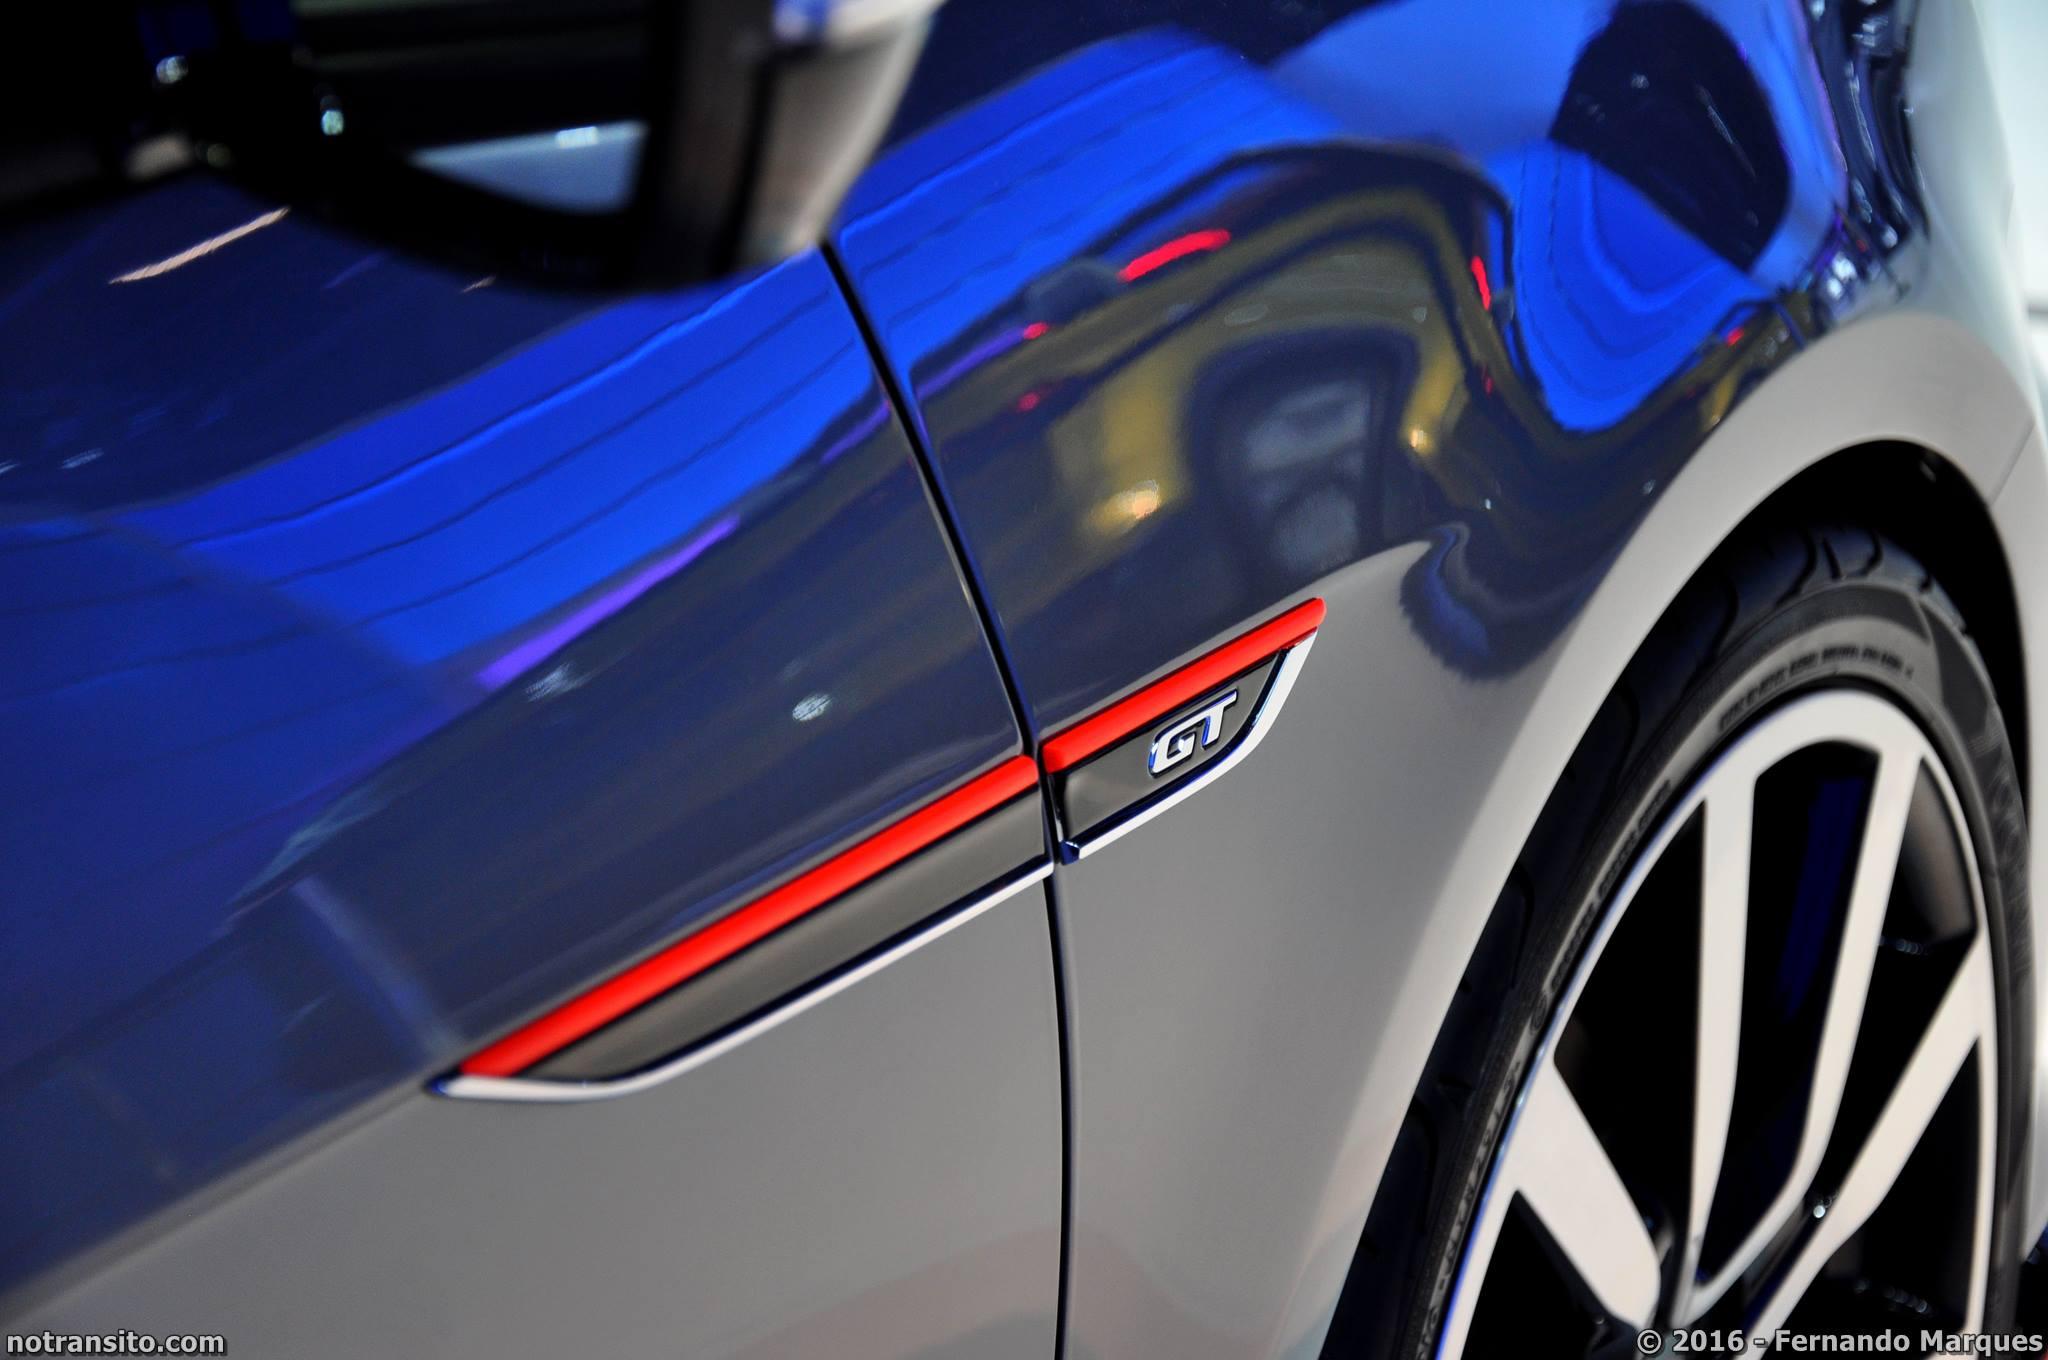 Volkswagen Gol GT Concept, Salão do Automóvel 2016, 29º Salão do Automóvel de São Paulo